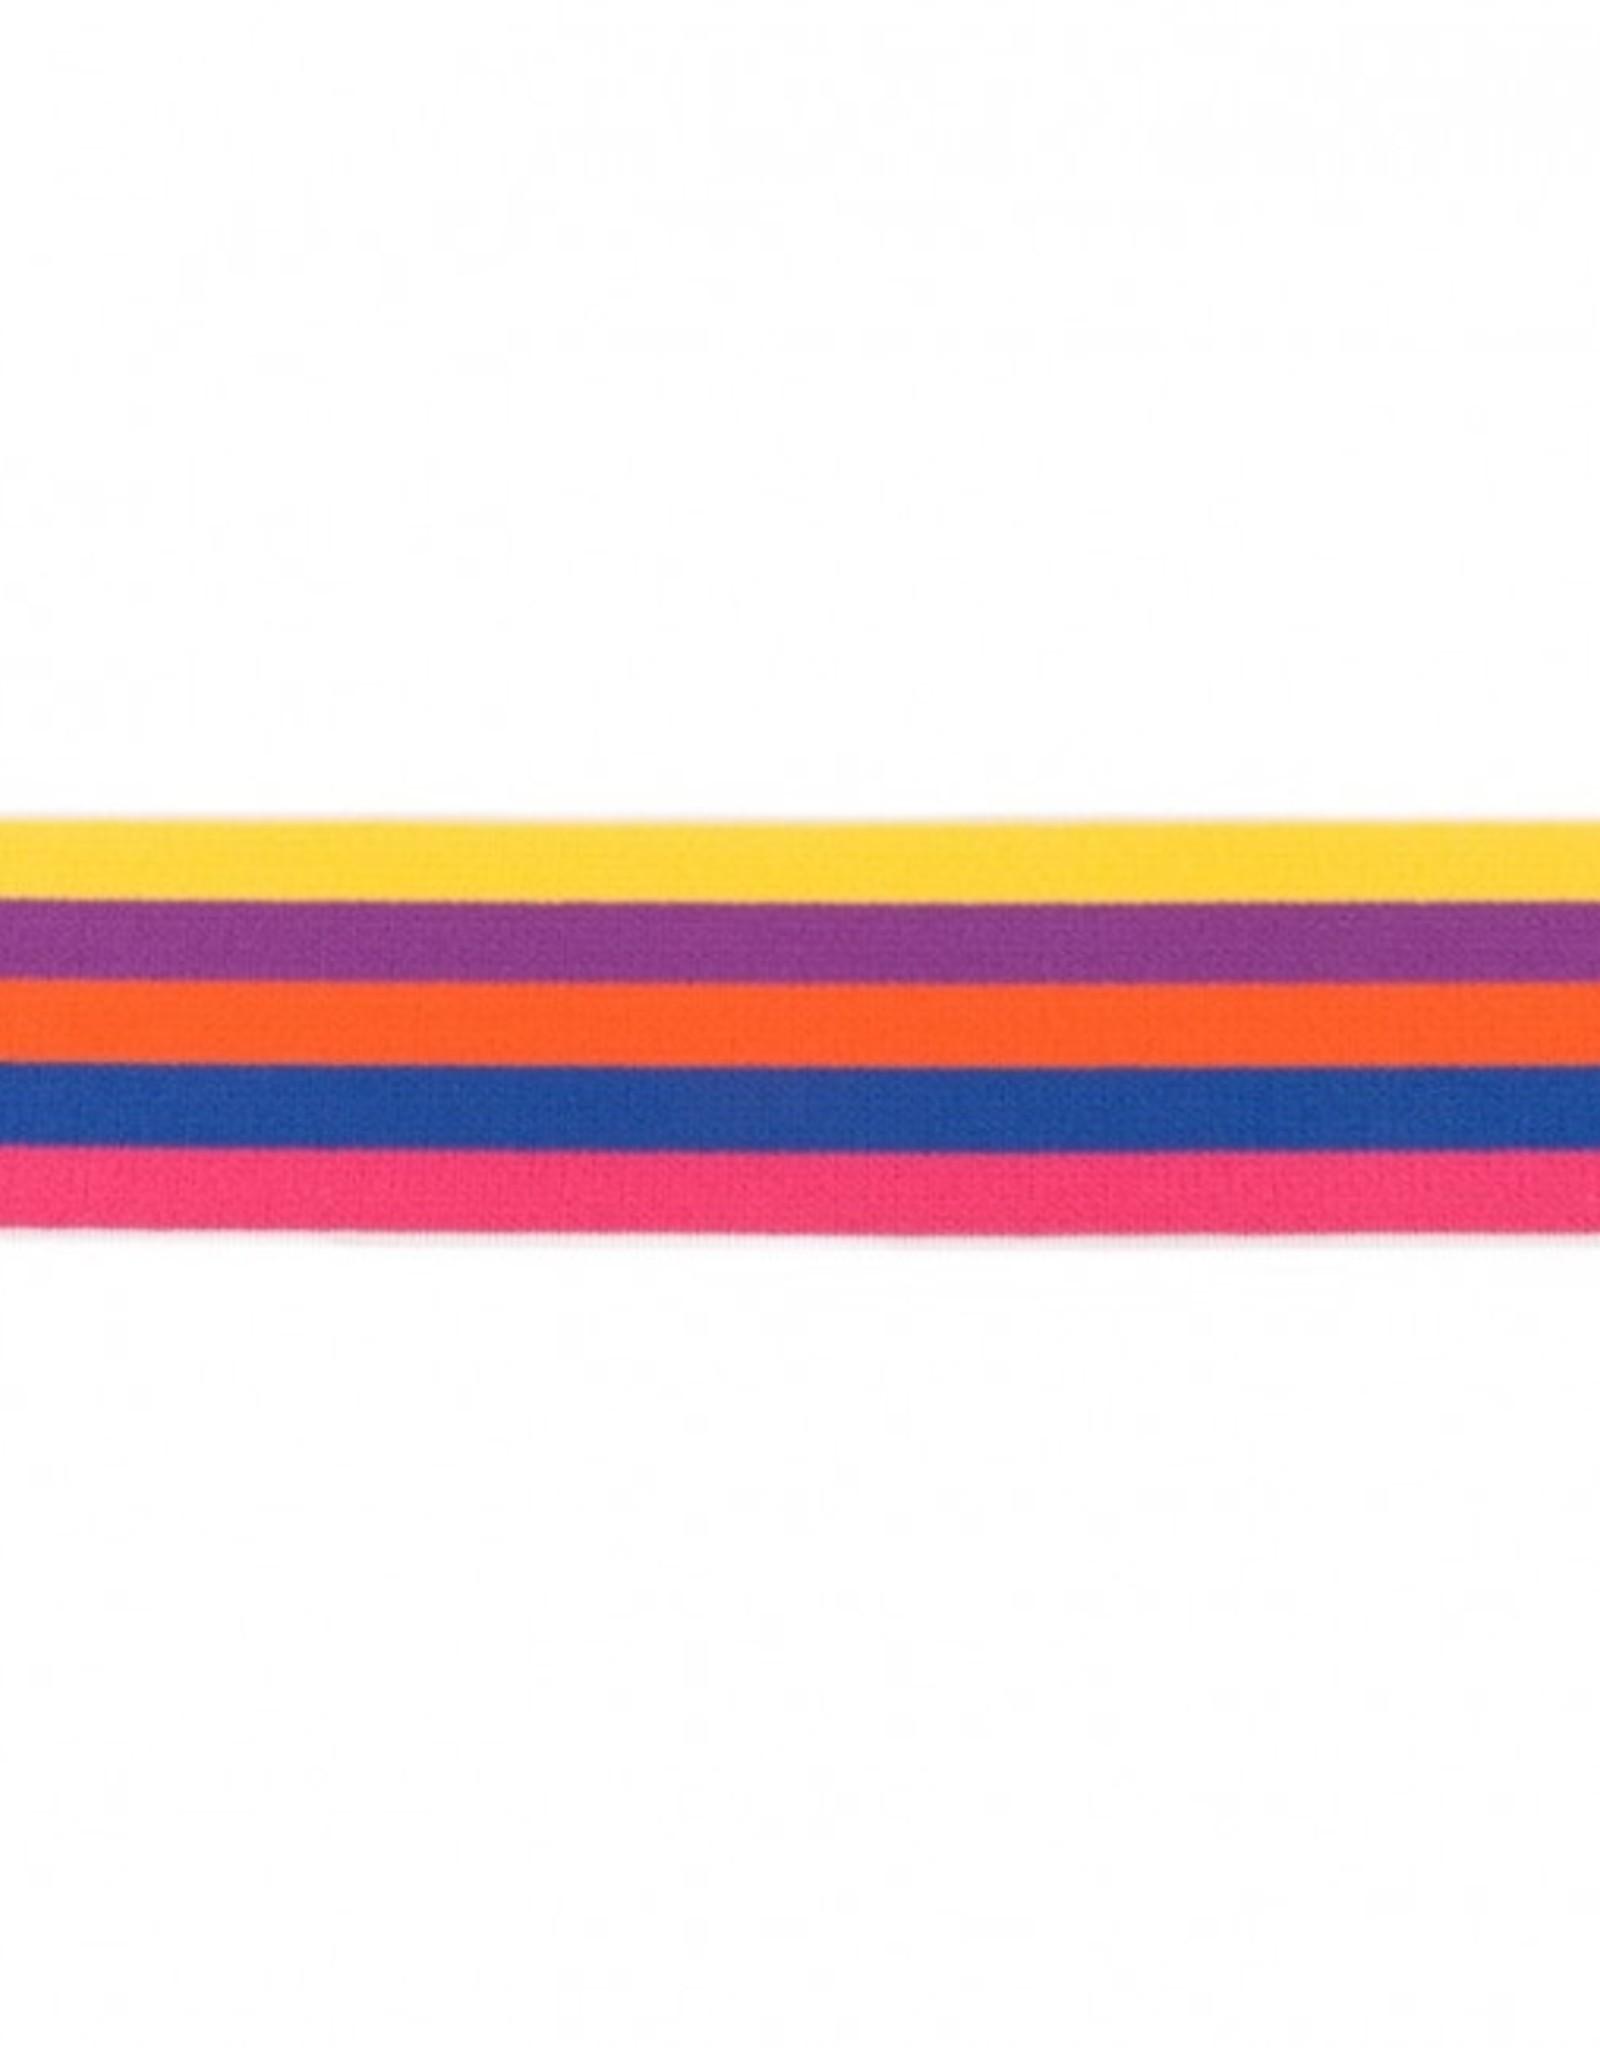 Elastiek multi streep 40 mm roze donkerblauw